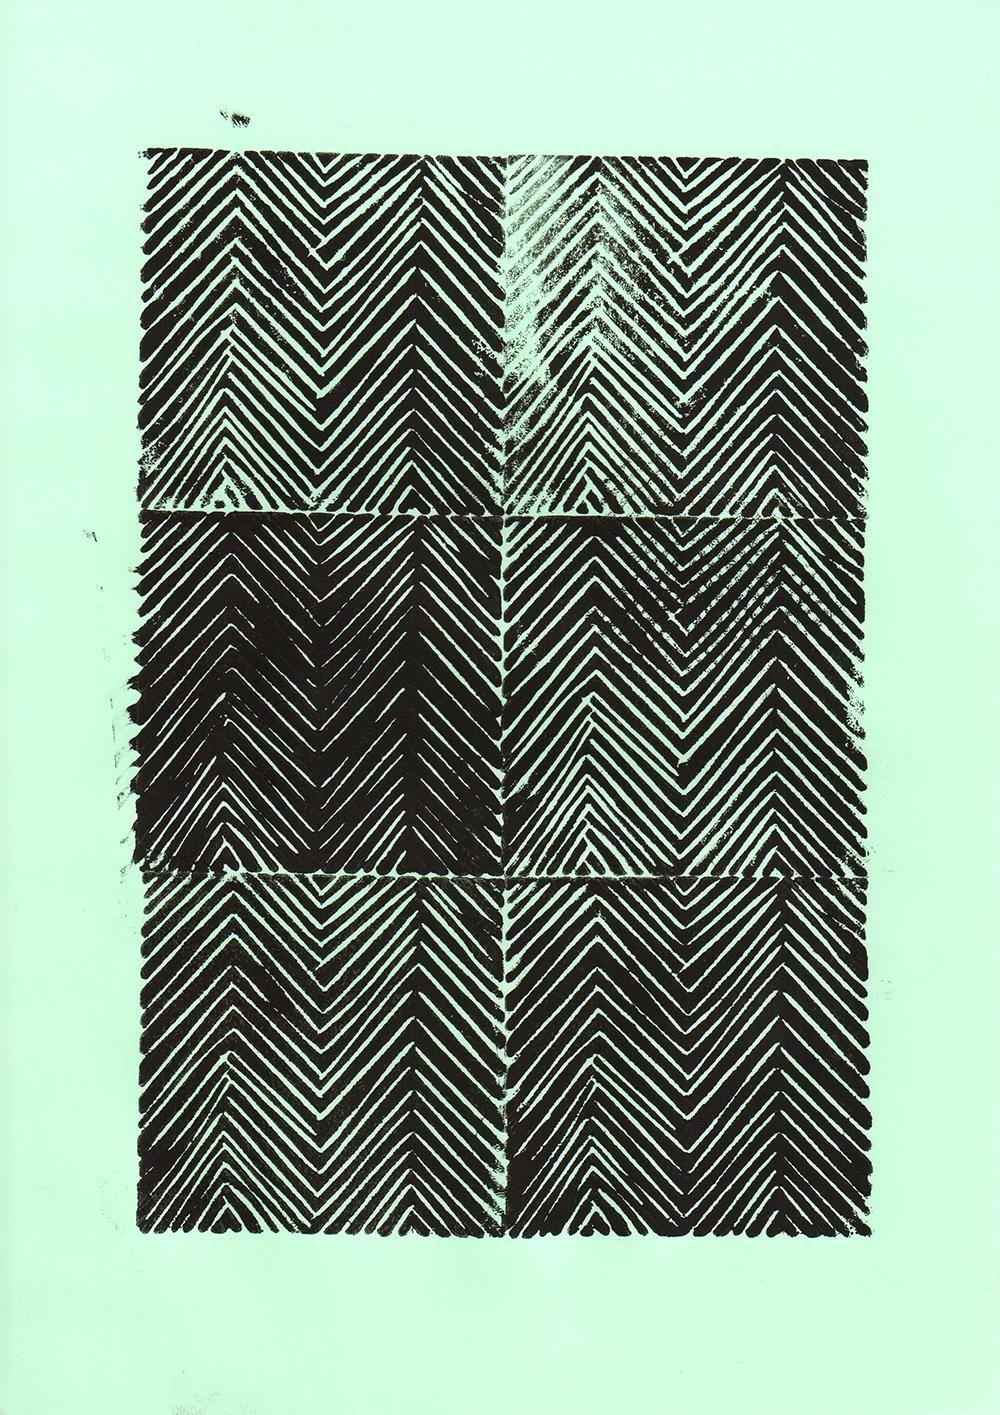 Geometric Linocut Patterns - image 9 - student project